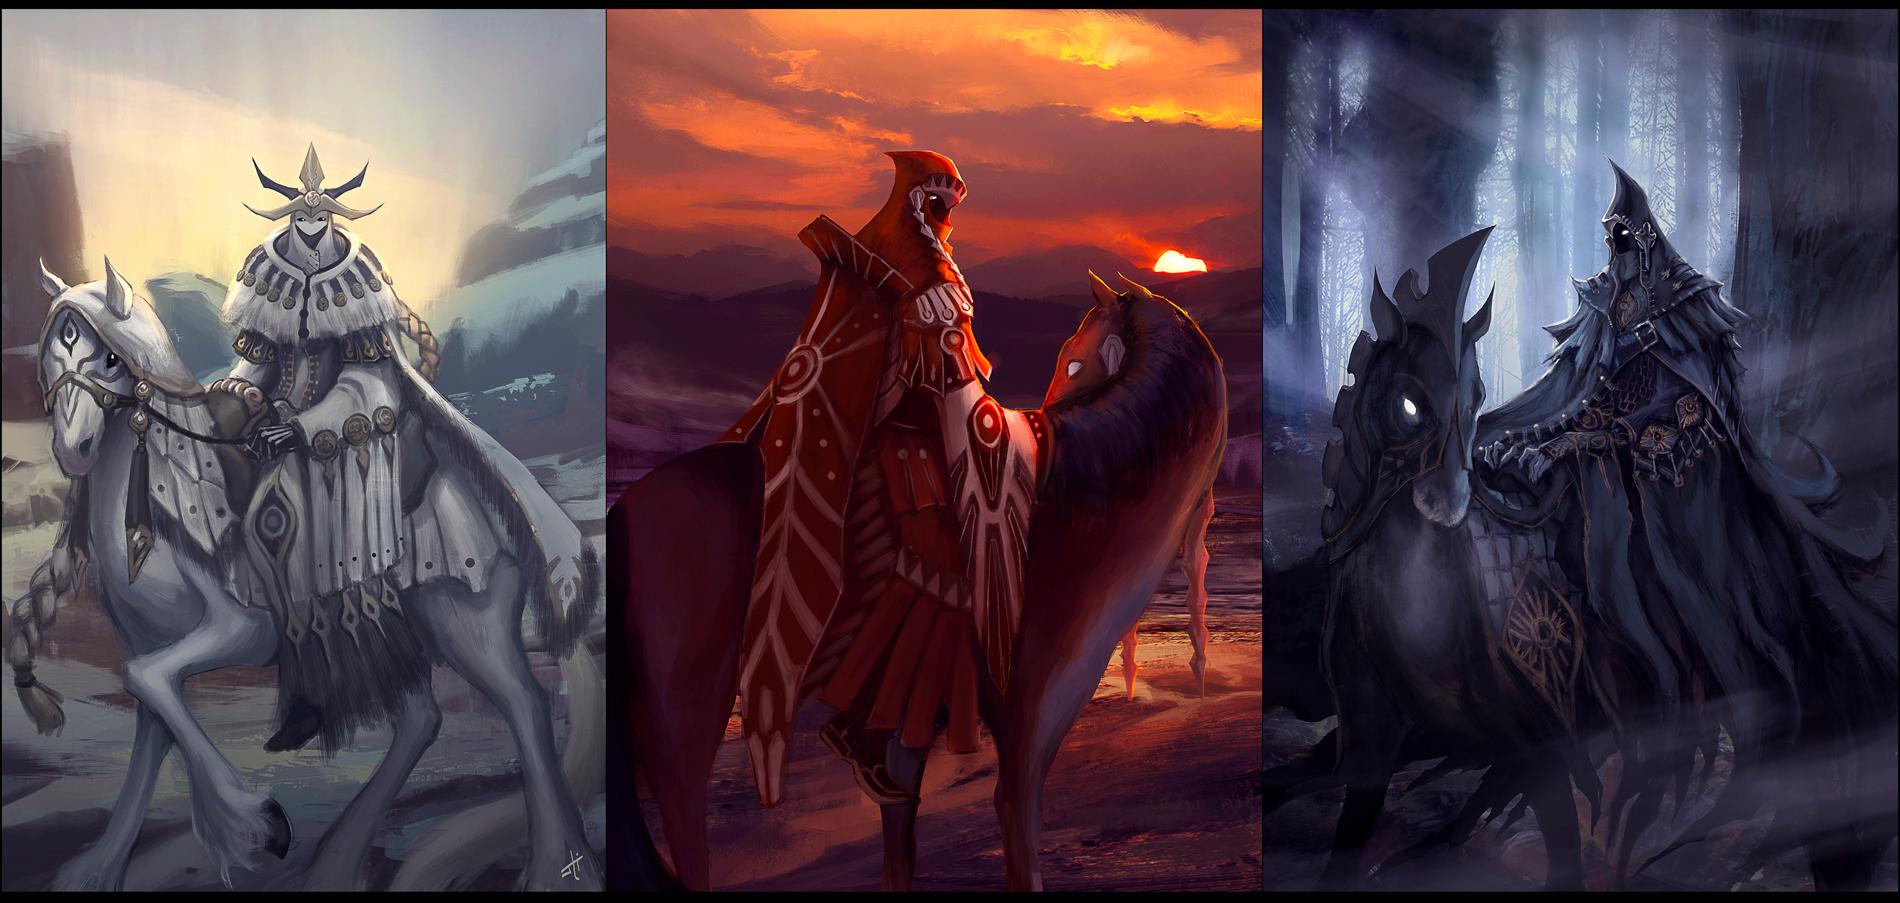 Three Horsemen by liyart